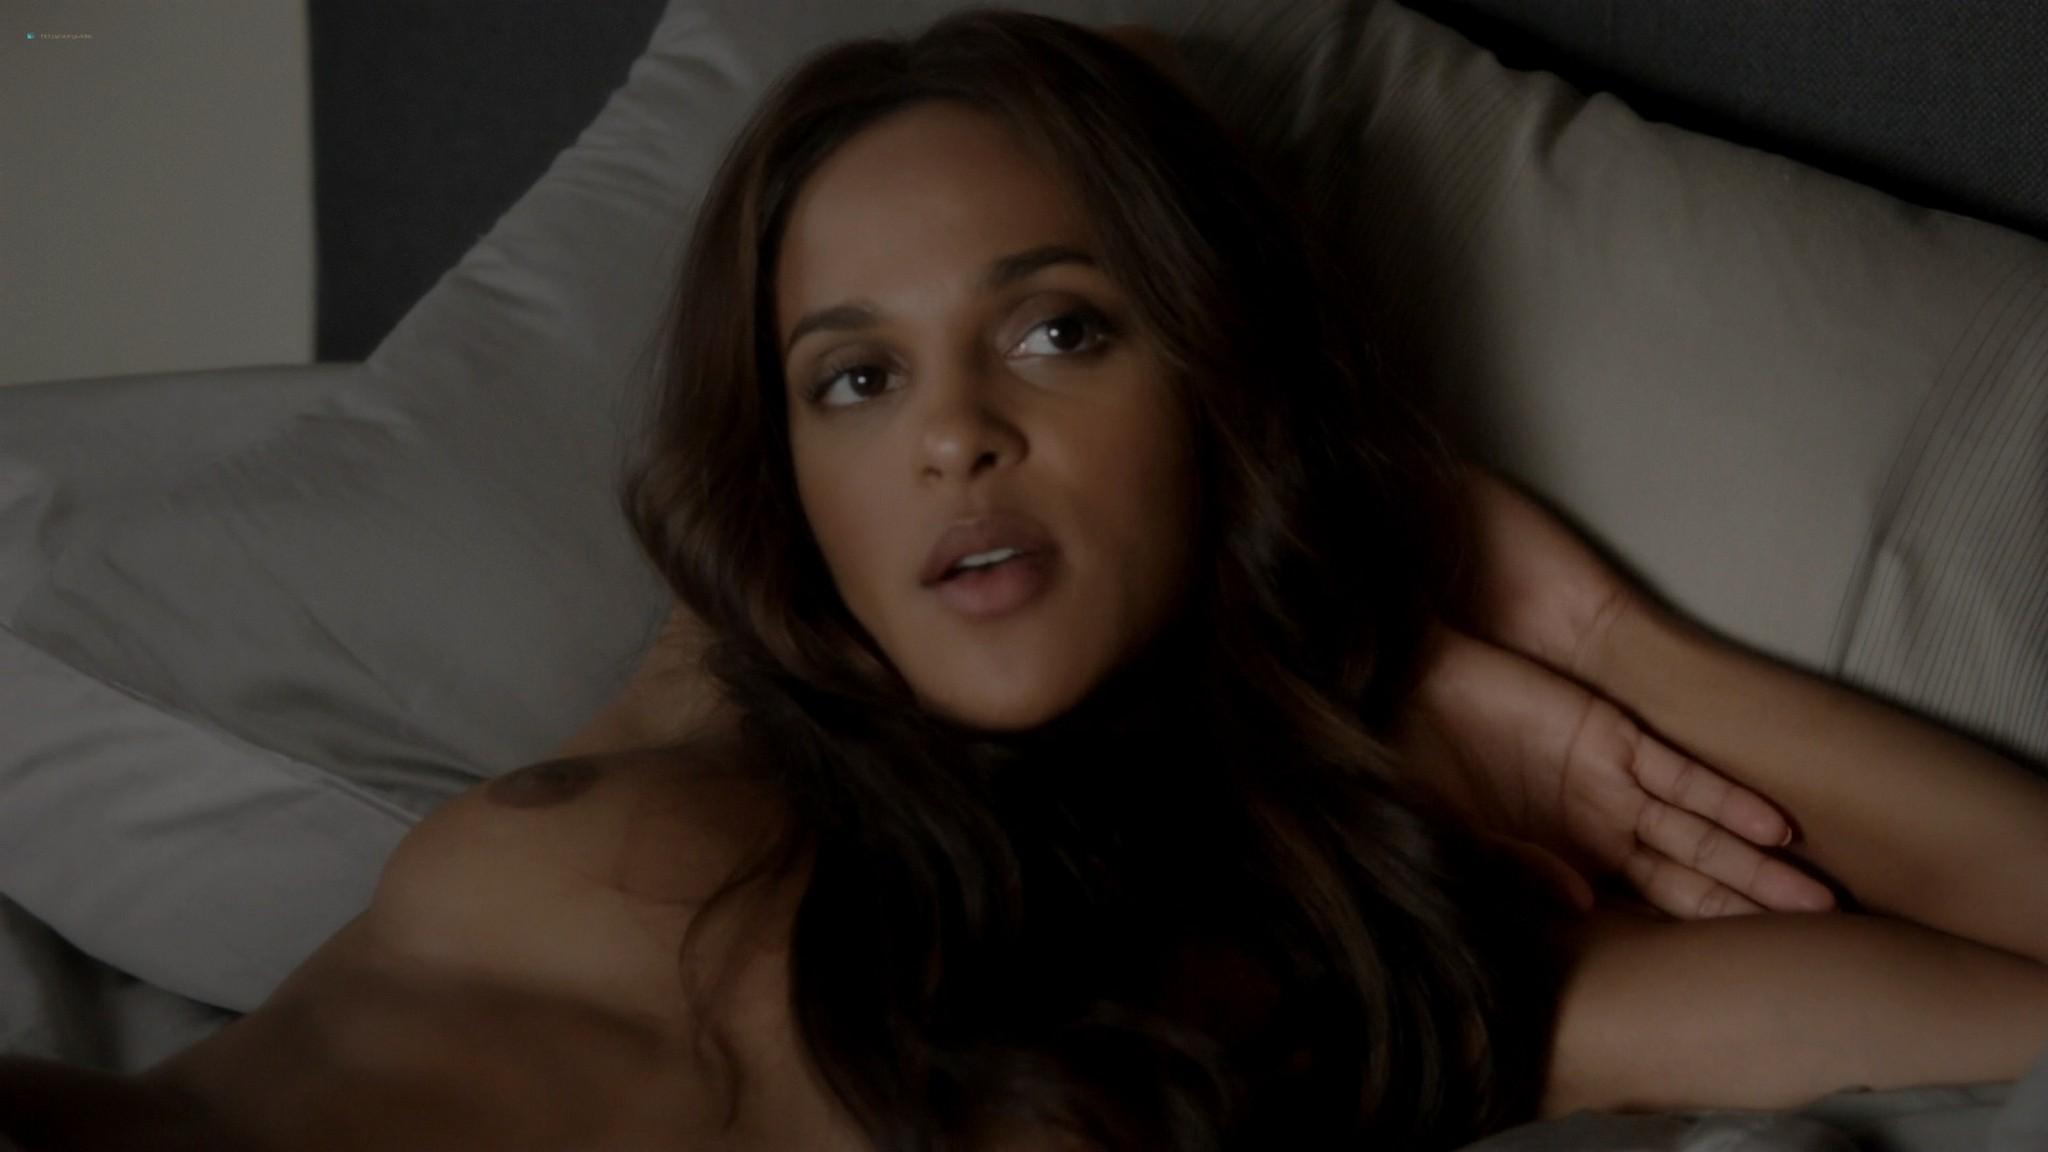 Megalyn Echikunwoke nude topless and Dawn Olivieri nude too House of Lies 2012 s1e7 1080p Web 4